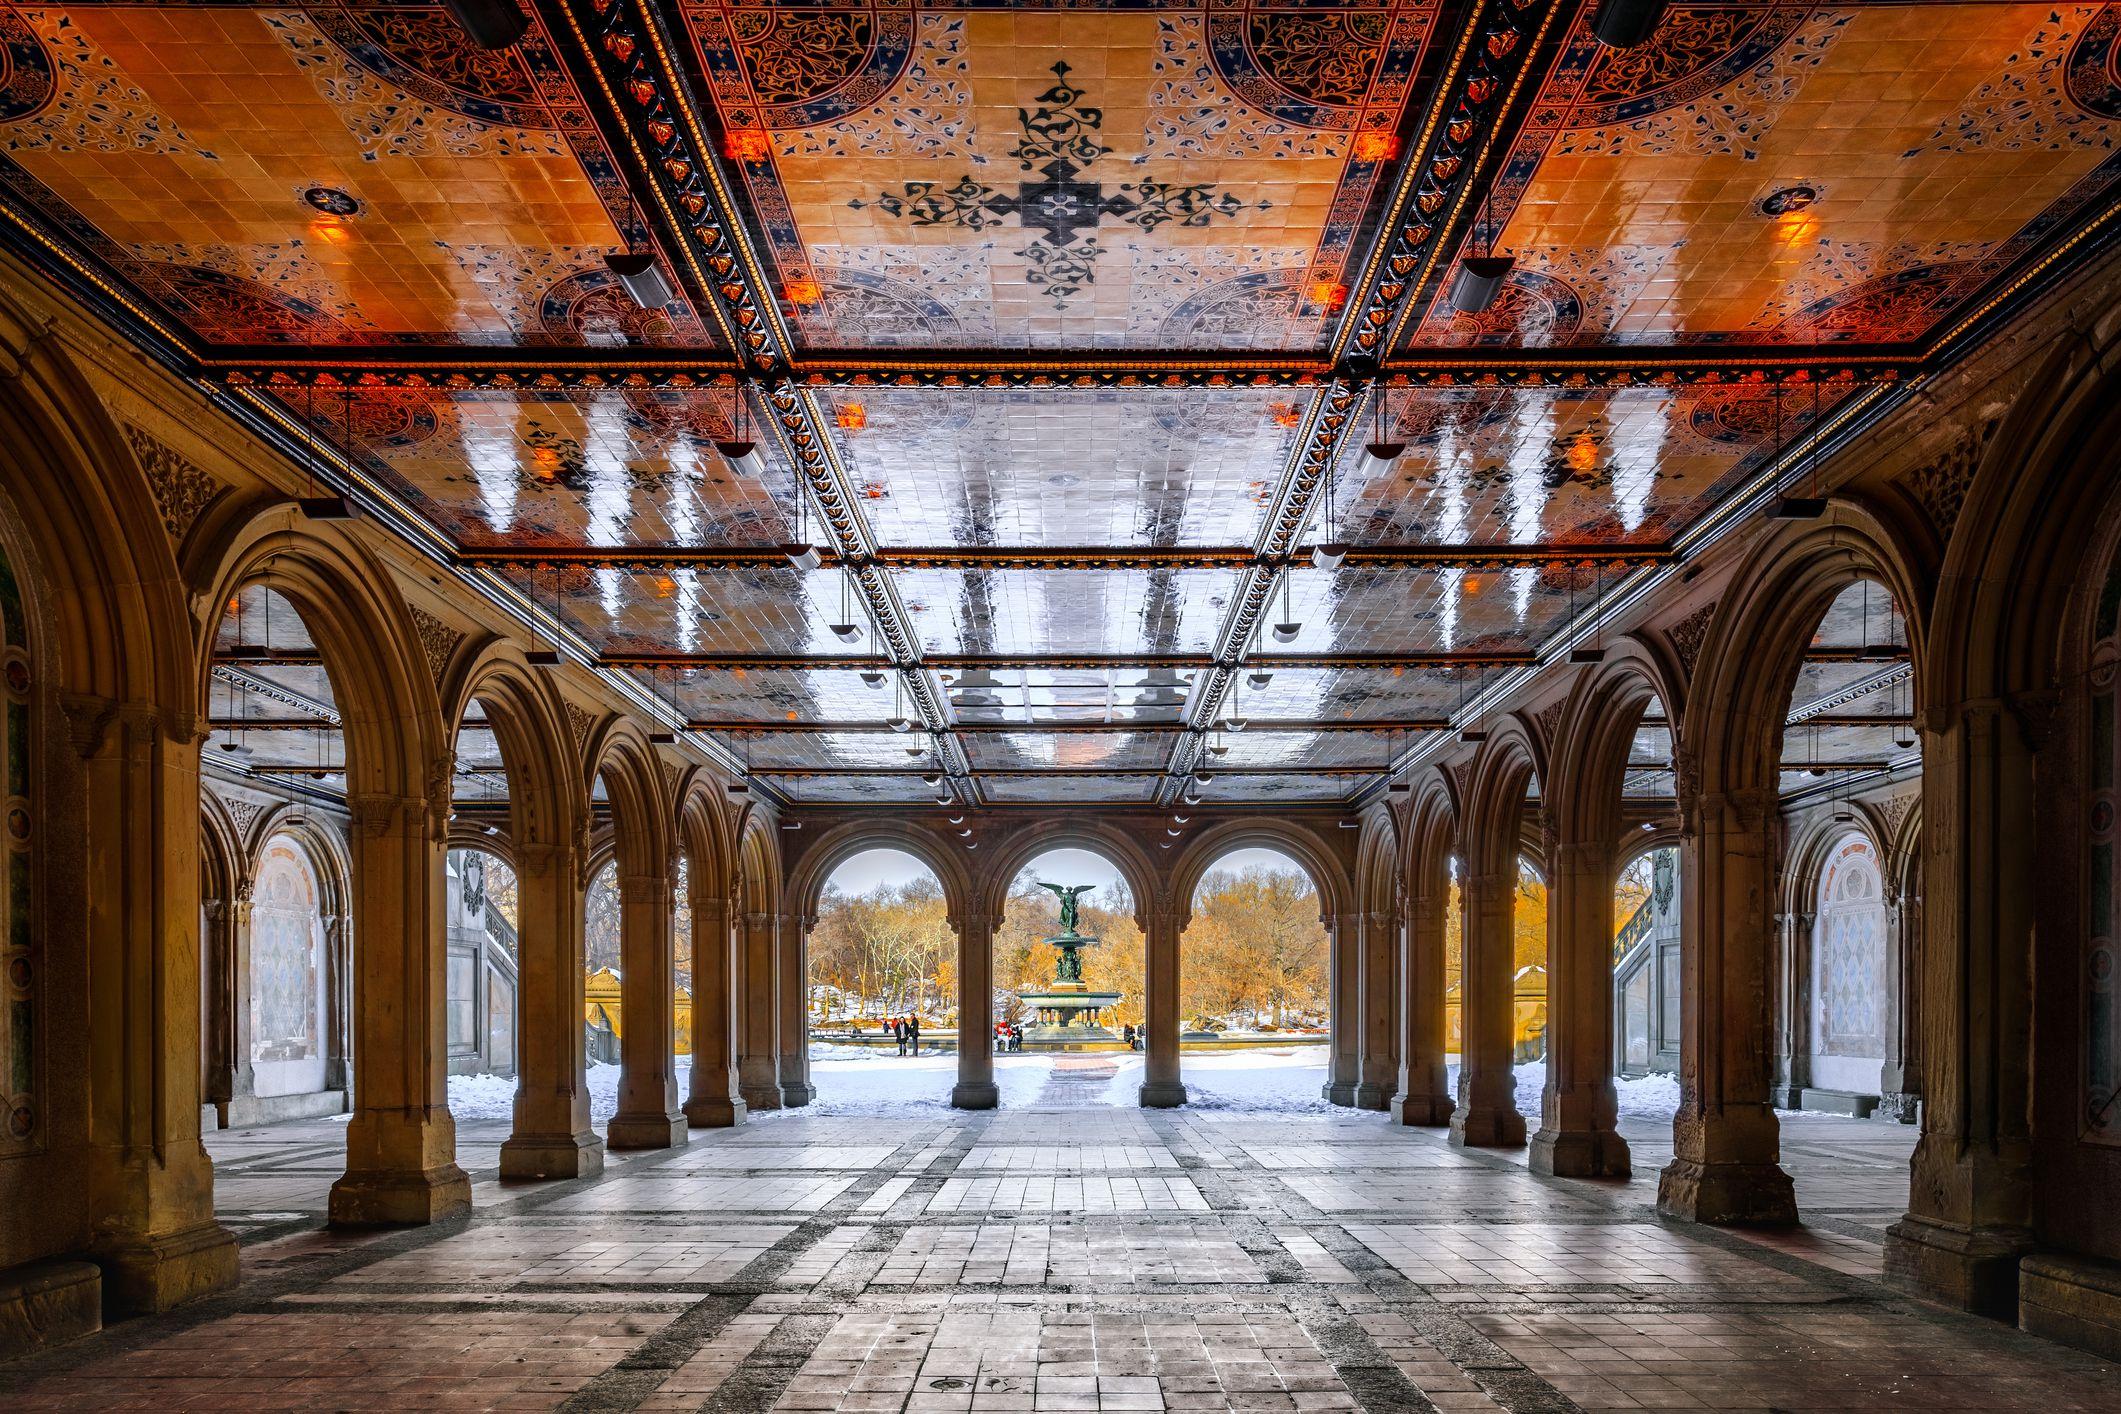 Bethesda Terrace, Central Park